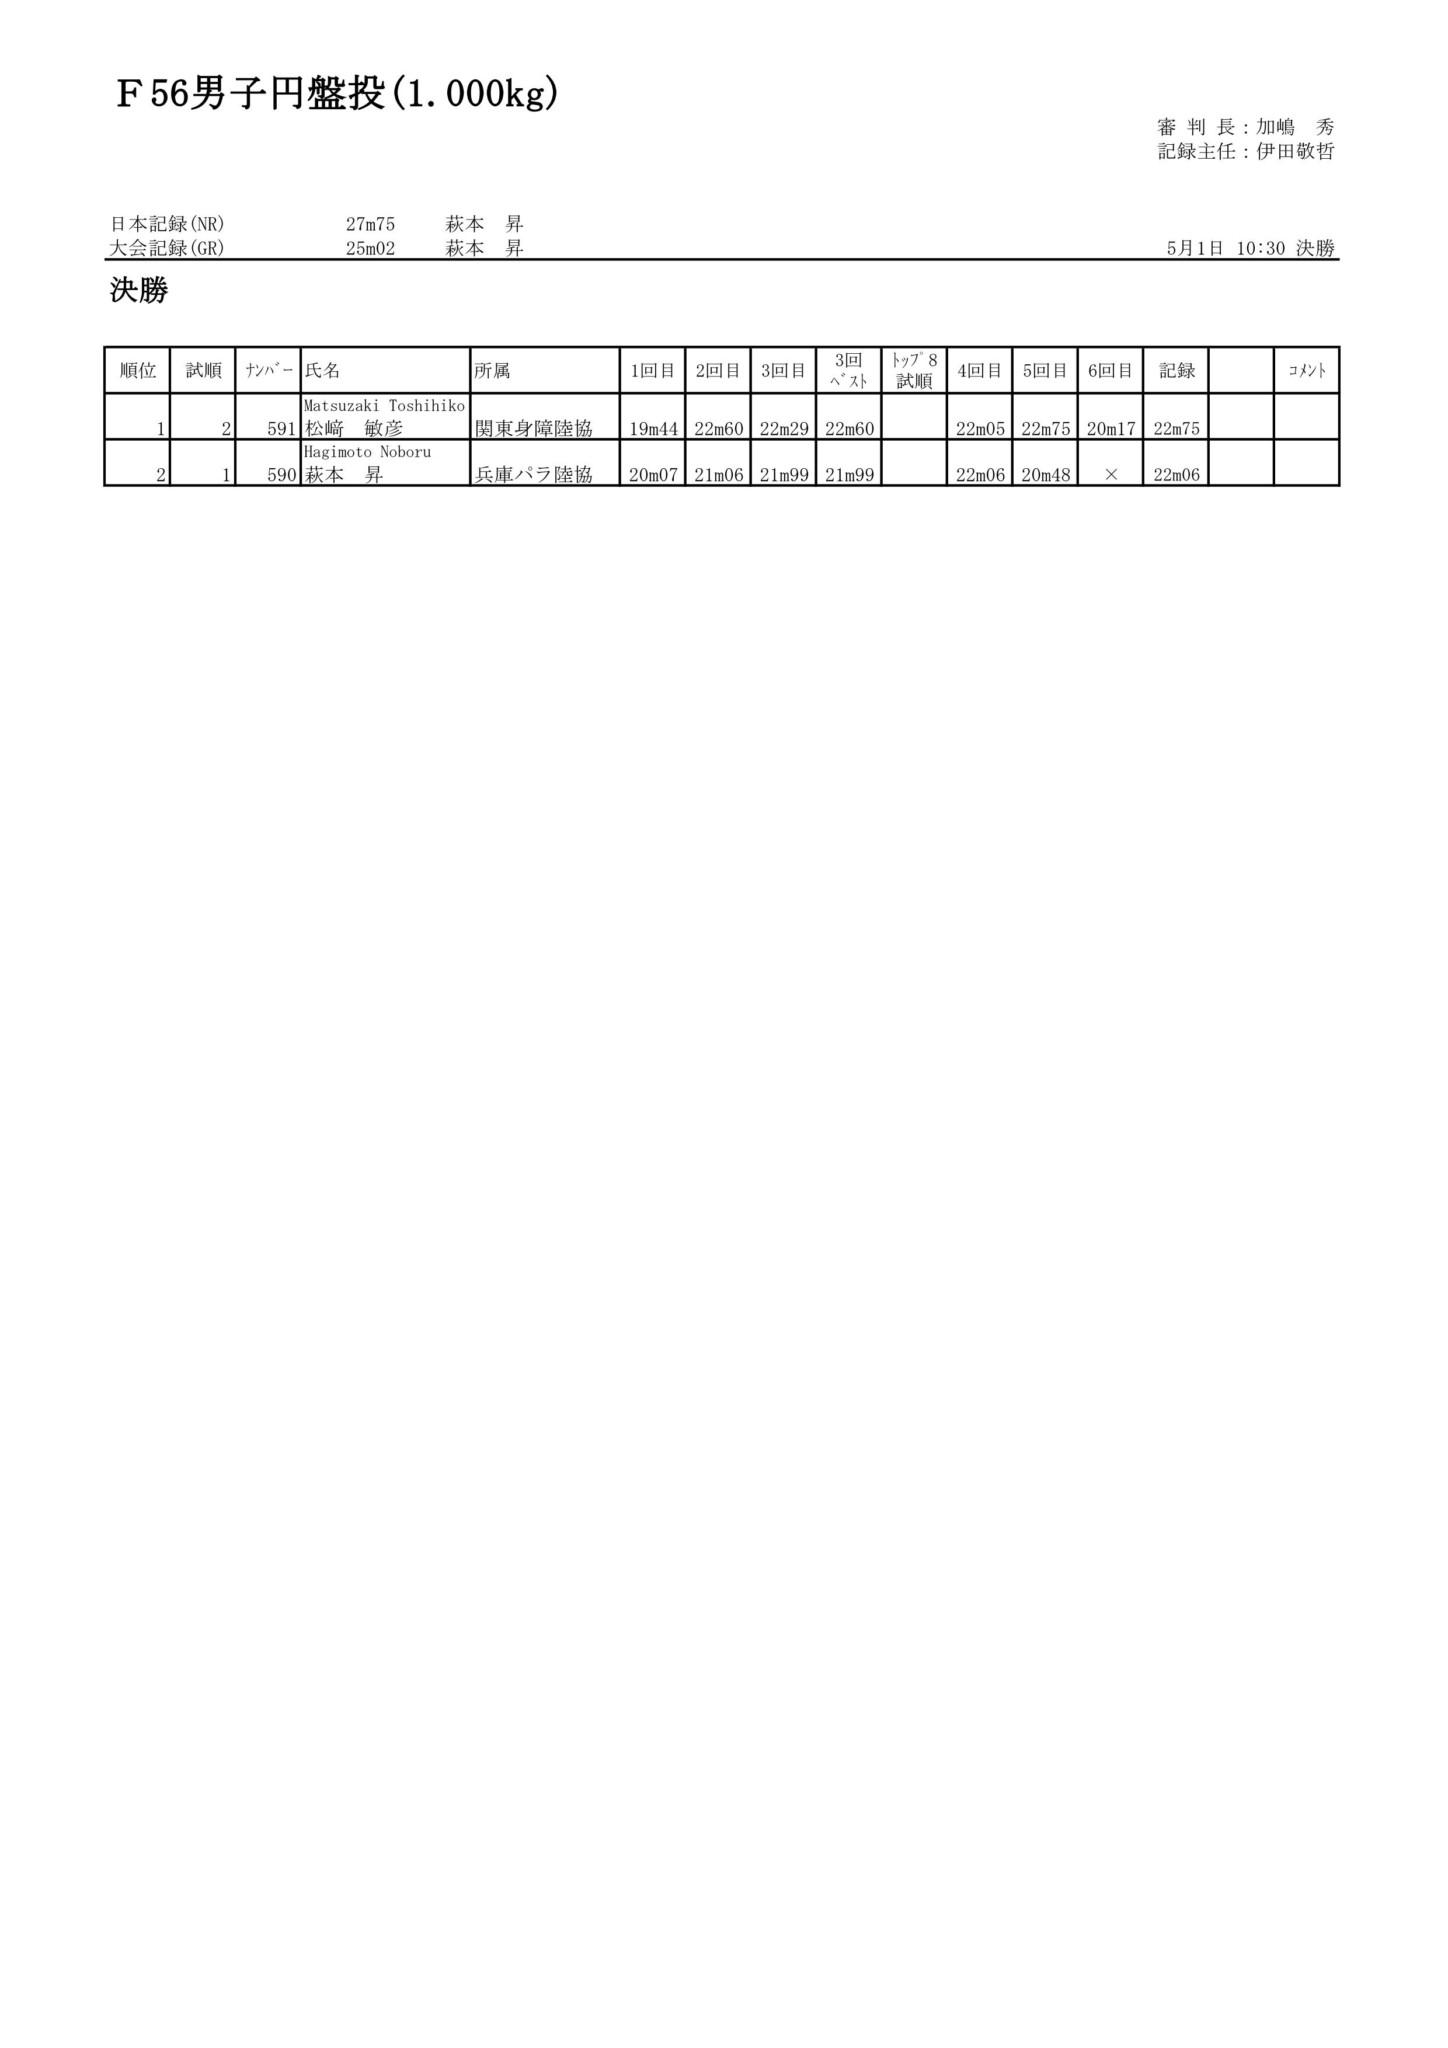 23F56男子円盤投(1.000kg)_01